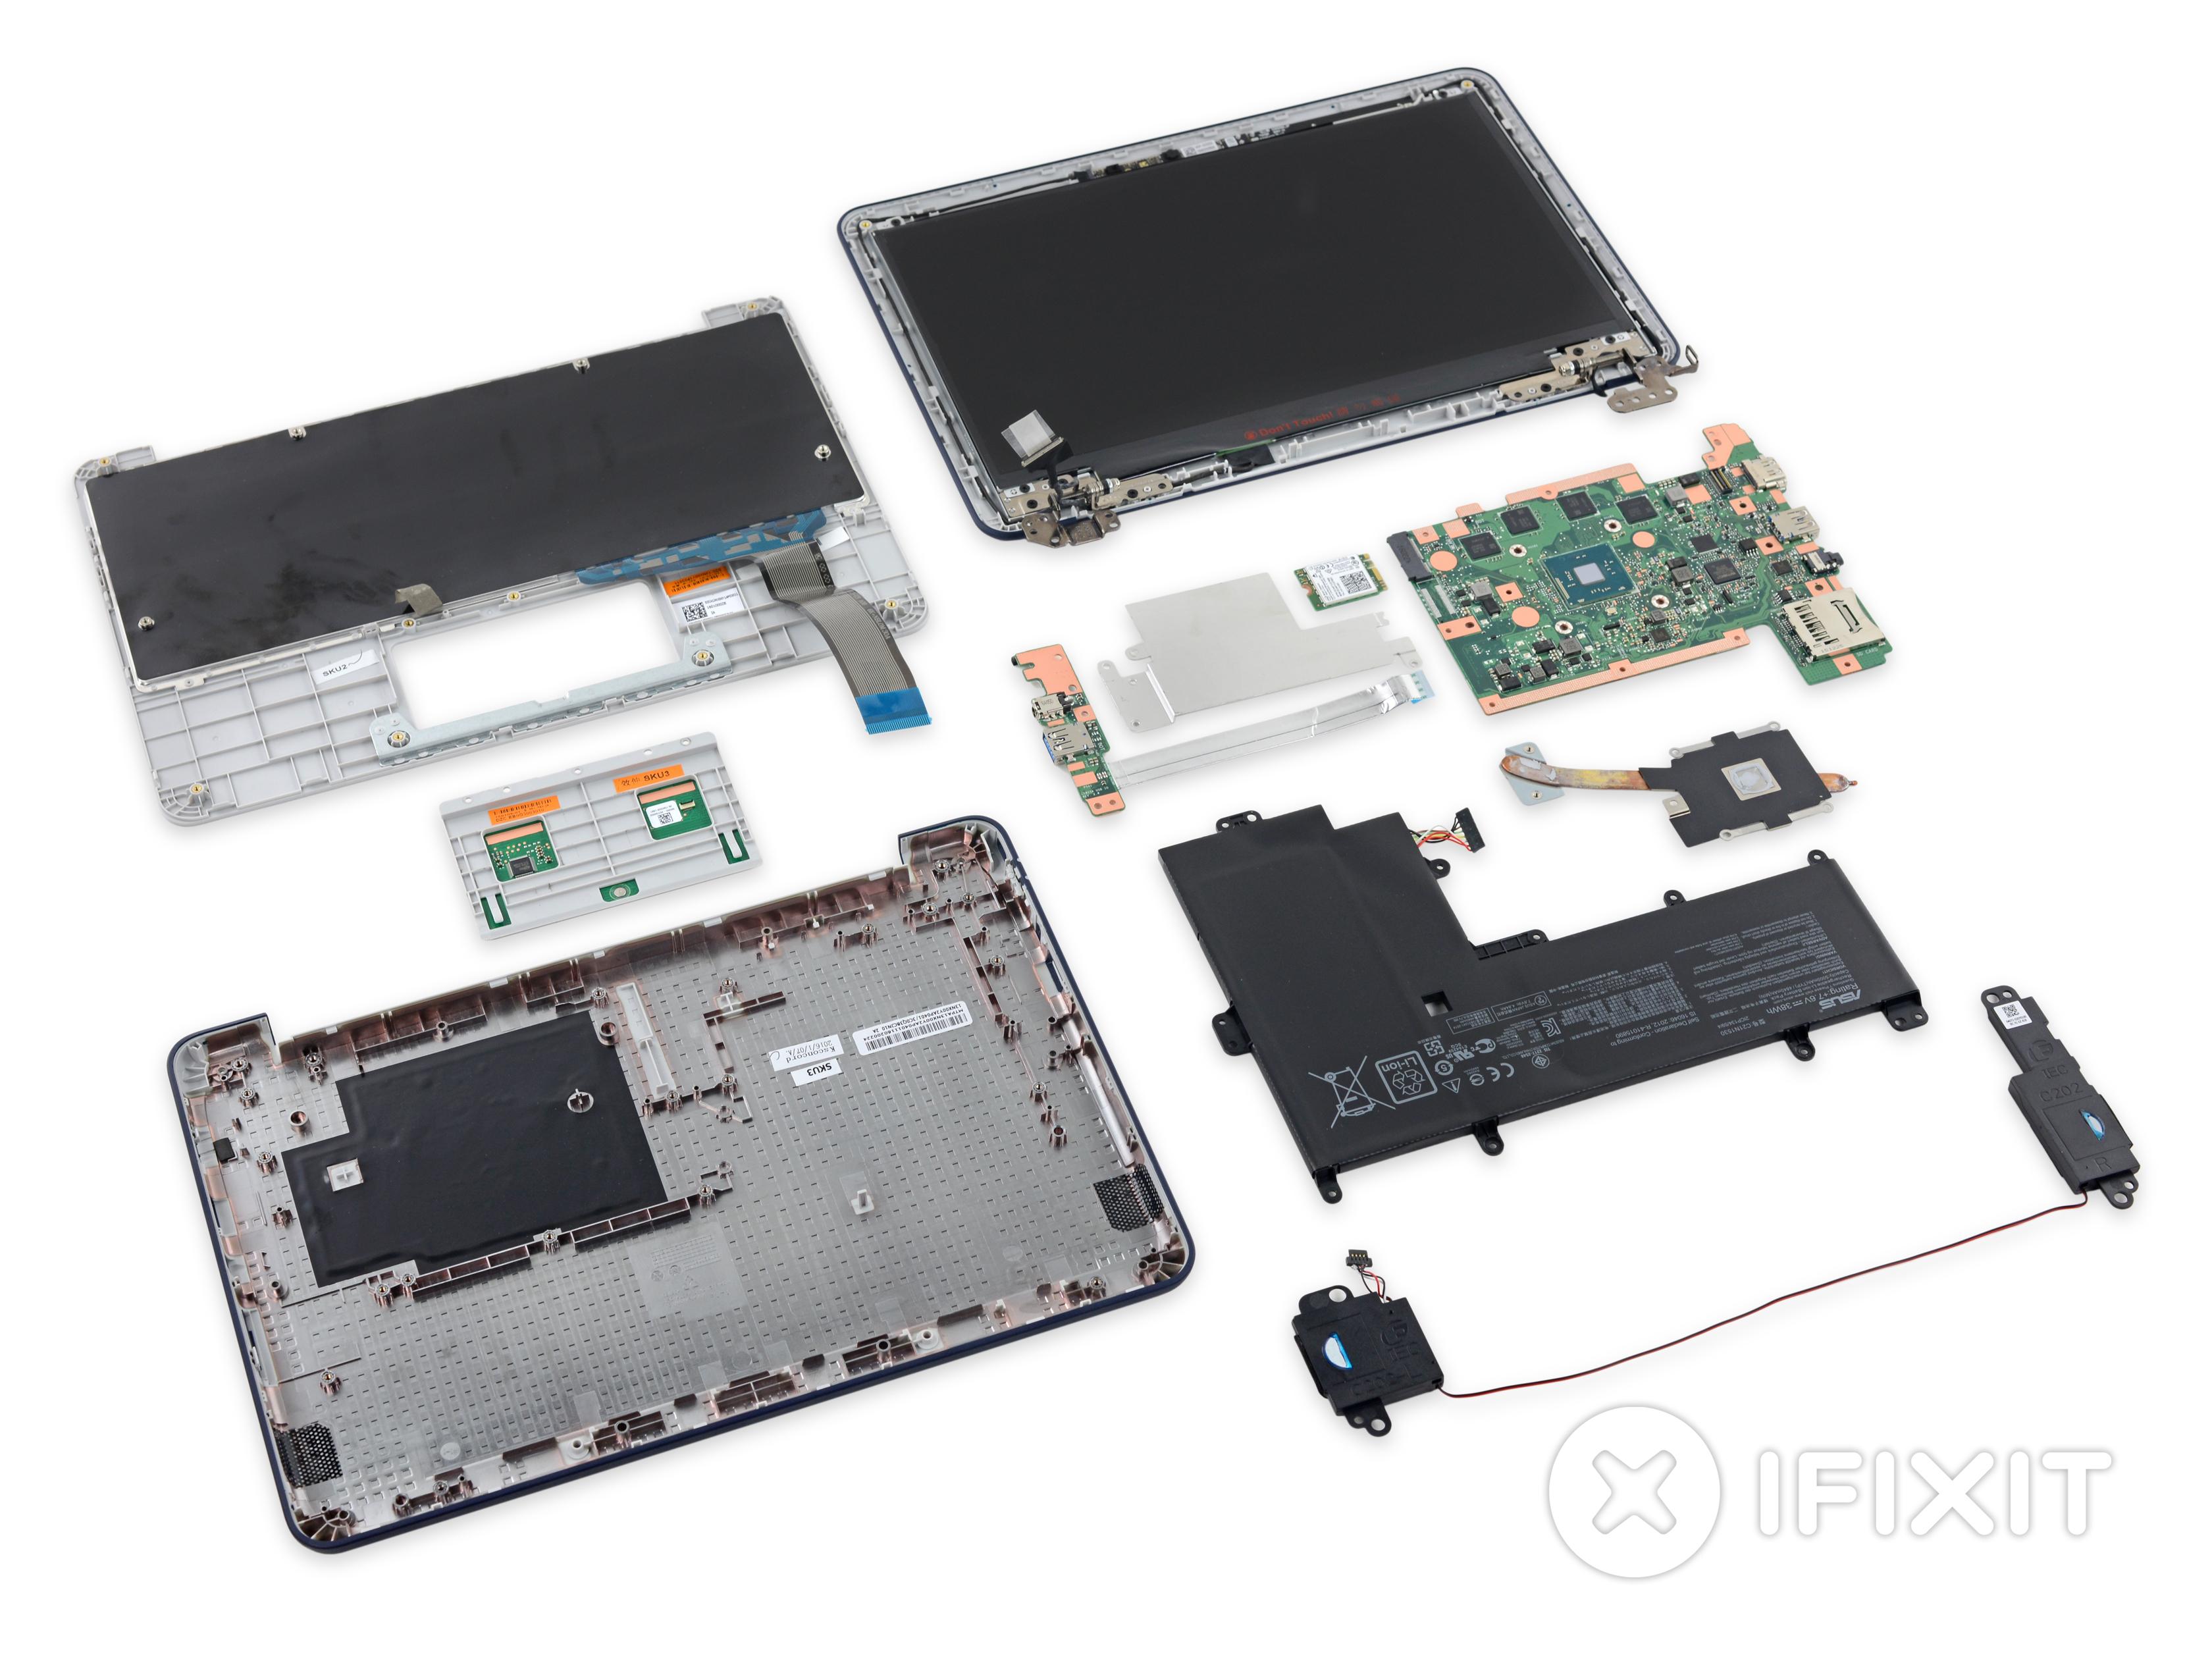 Asus Chromebook C202 Teardown Ifixit Frame Keybord Laptop X 455 Casing